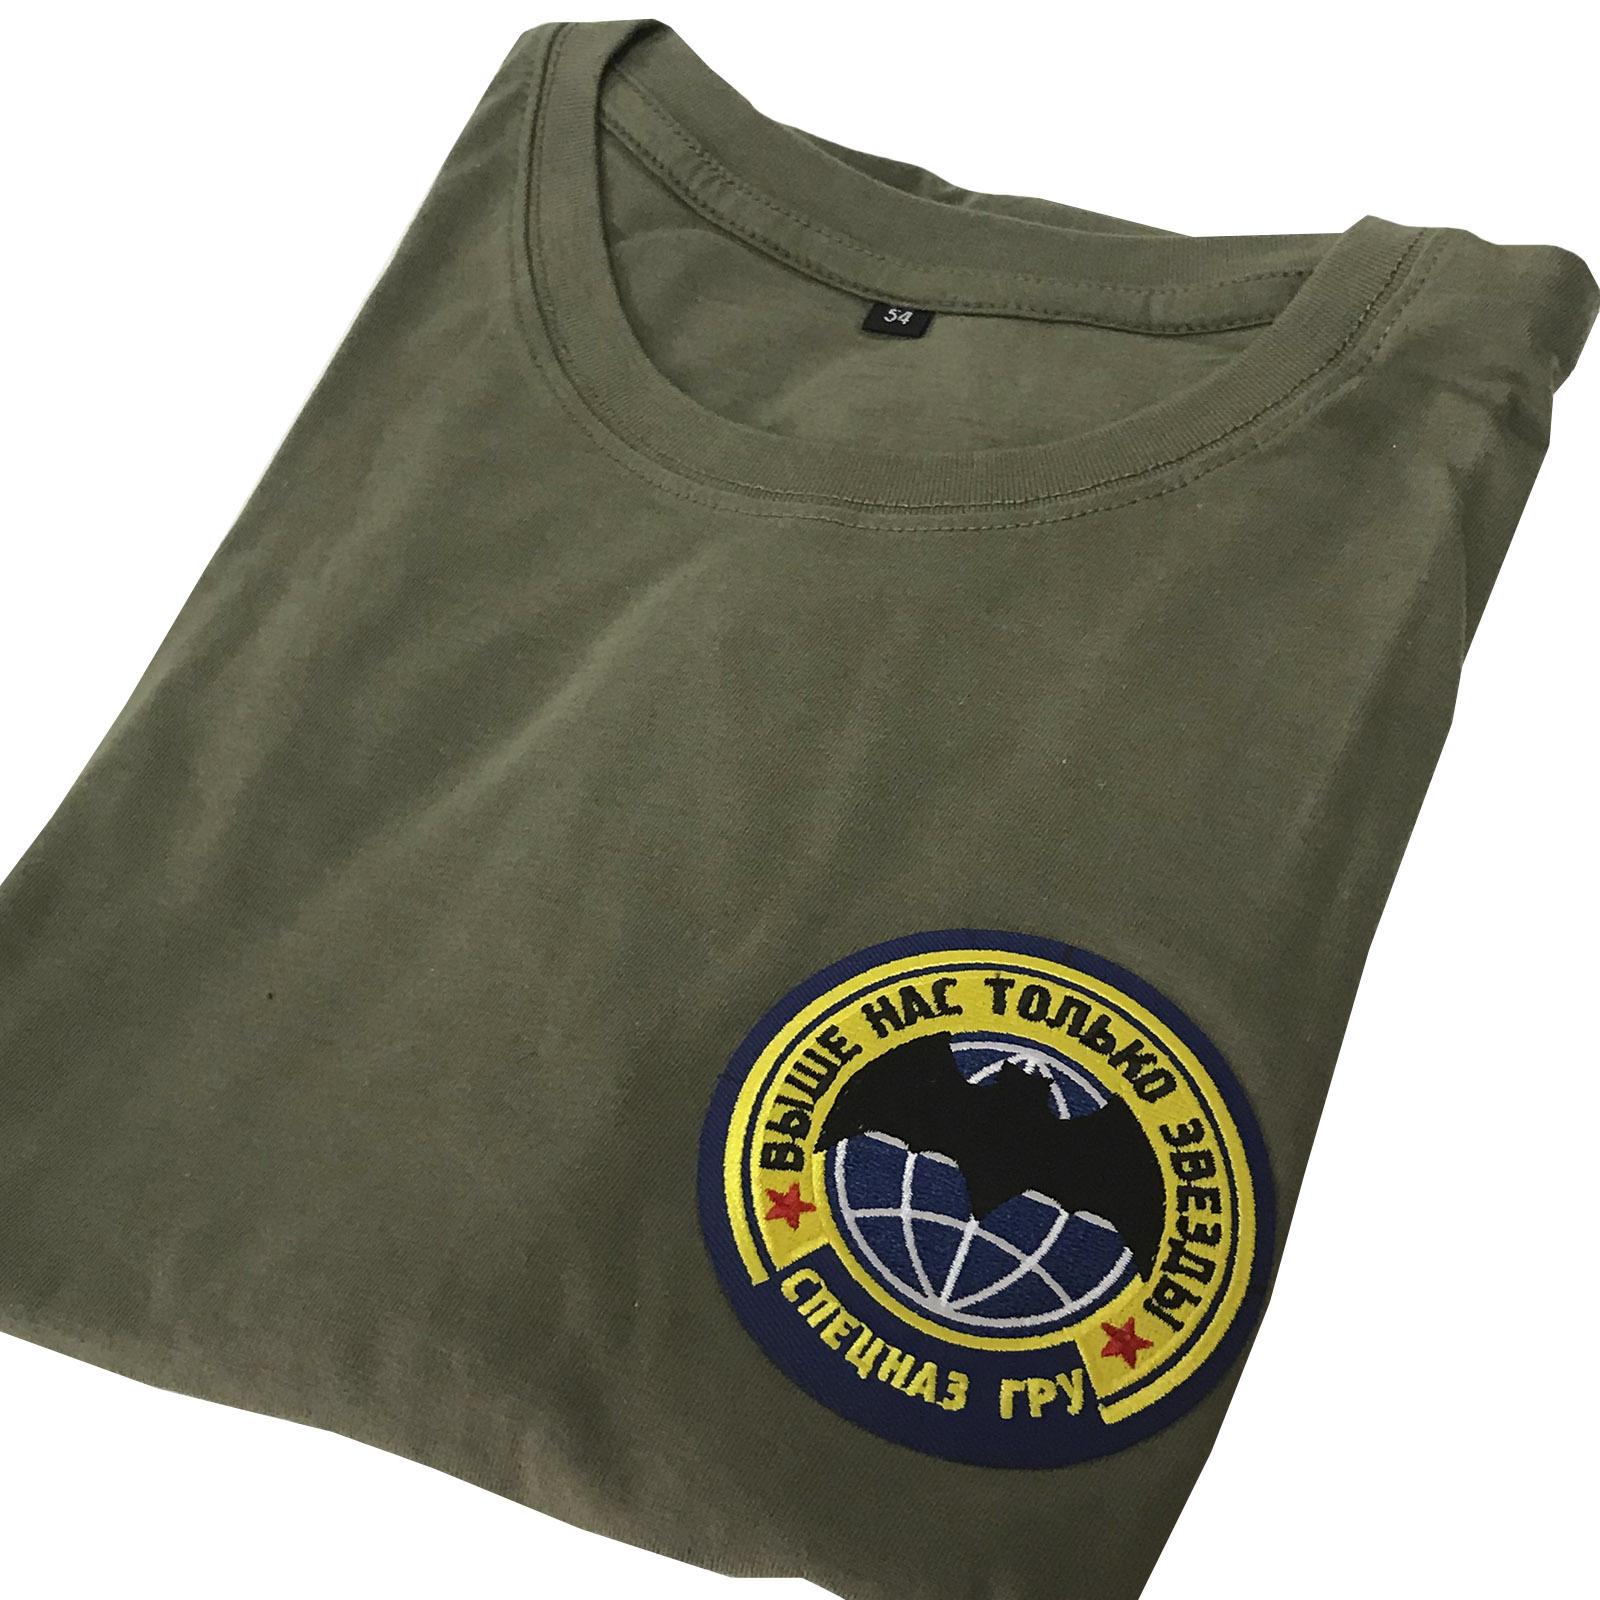 Стильная милитари футболка с девизом Спецназа ГРУ